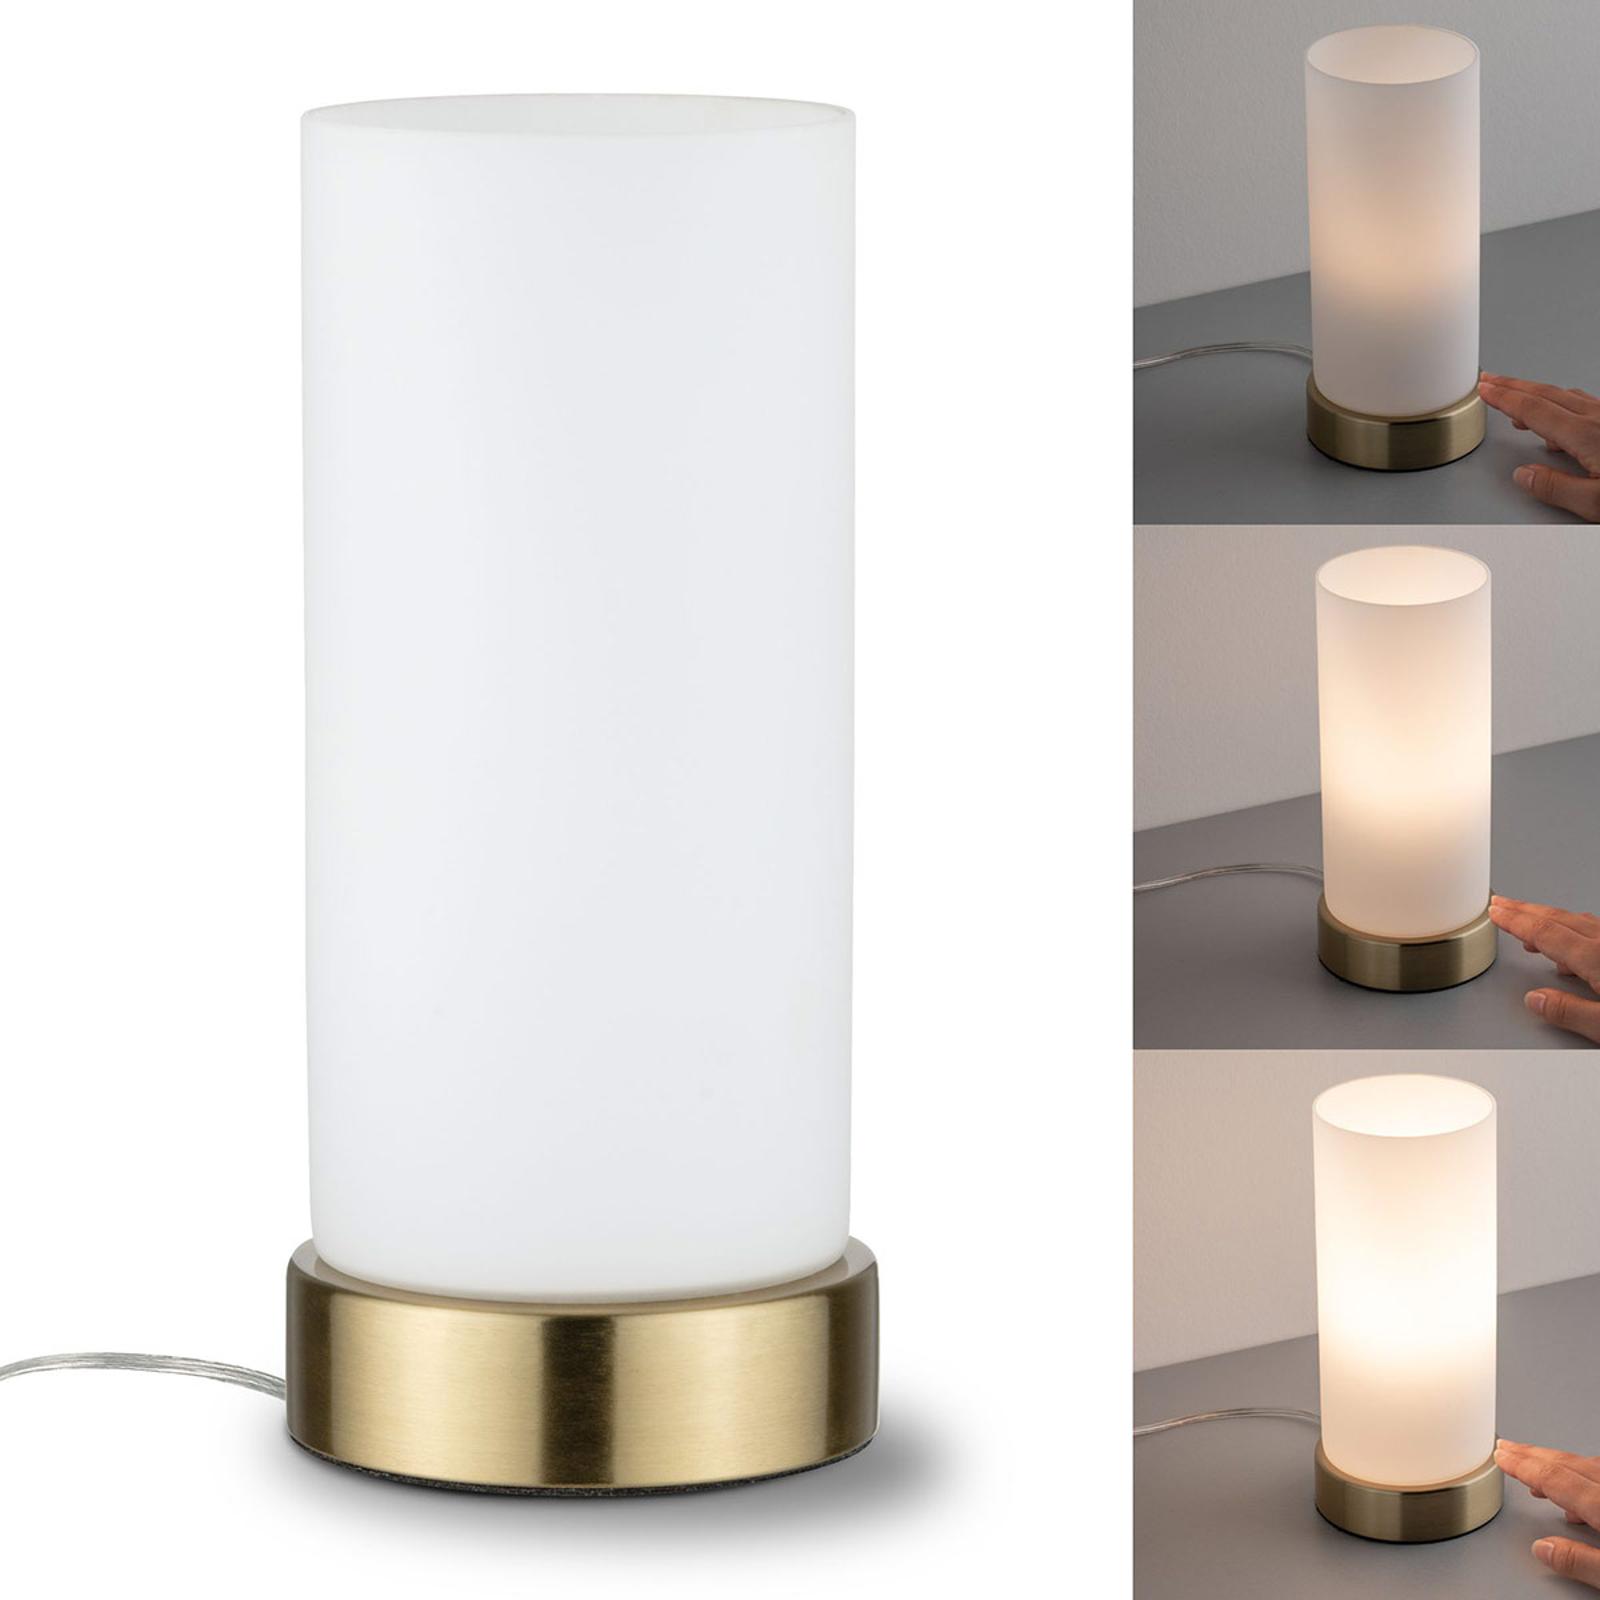 Paulmann lampe à poser Pinja laiton/opale